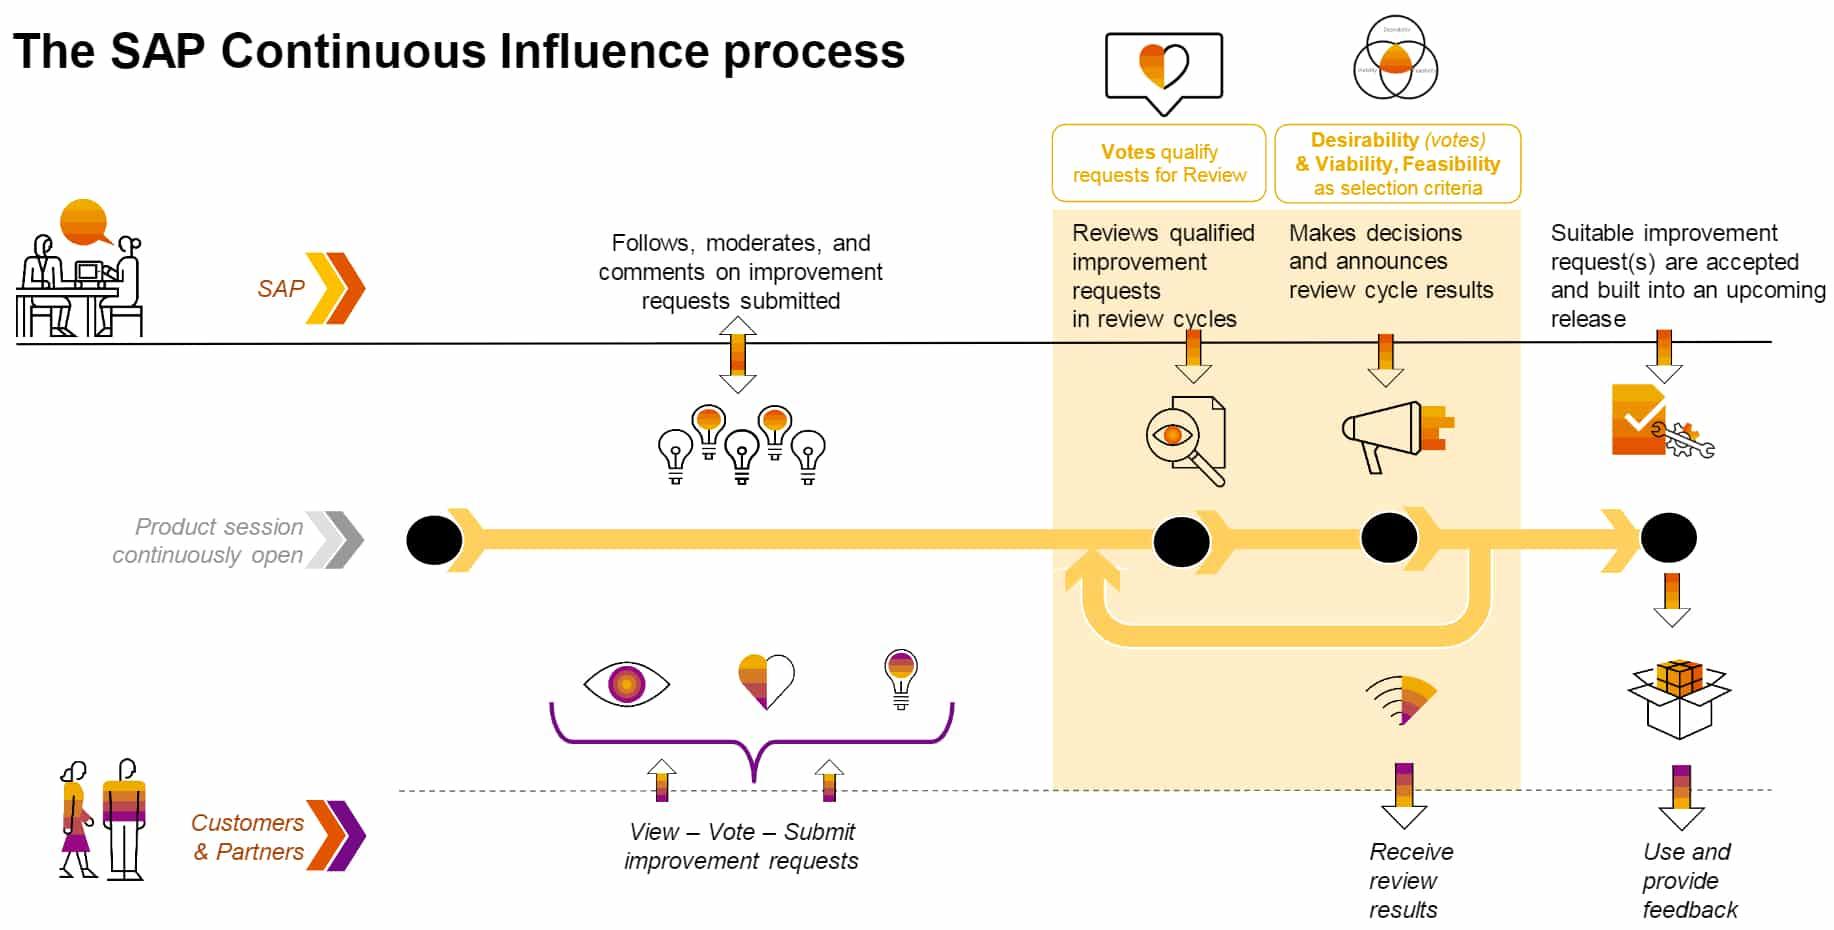 SAP Continuous Influence